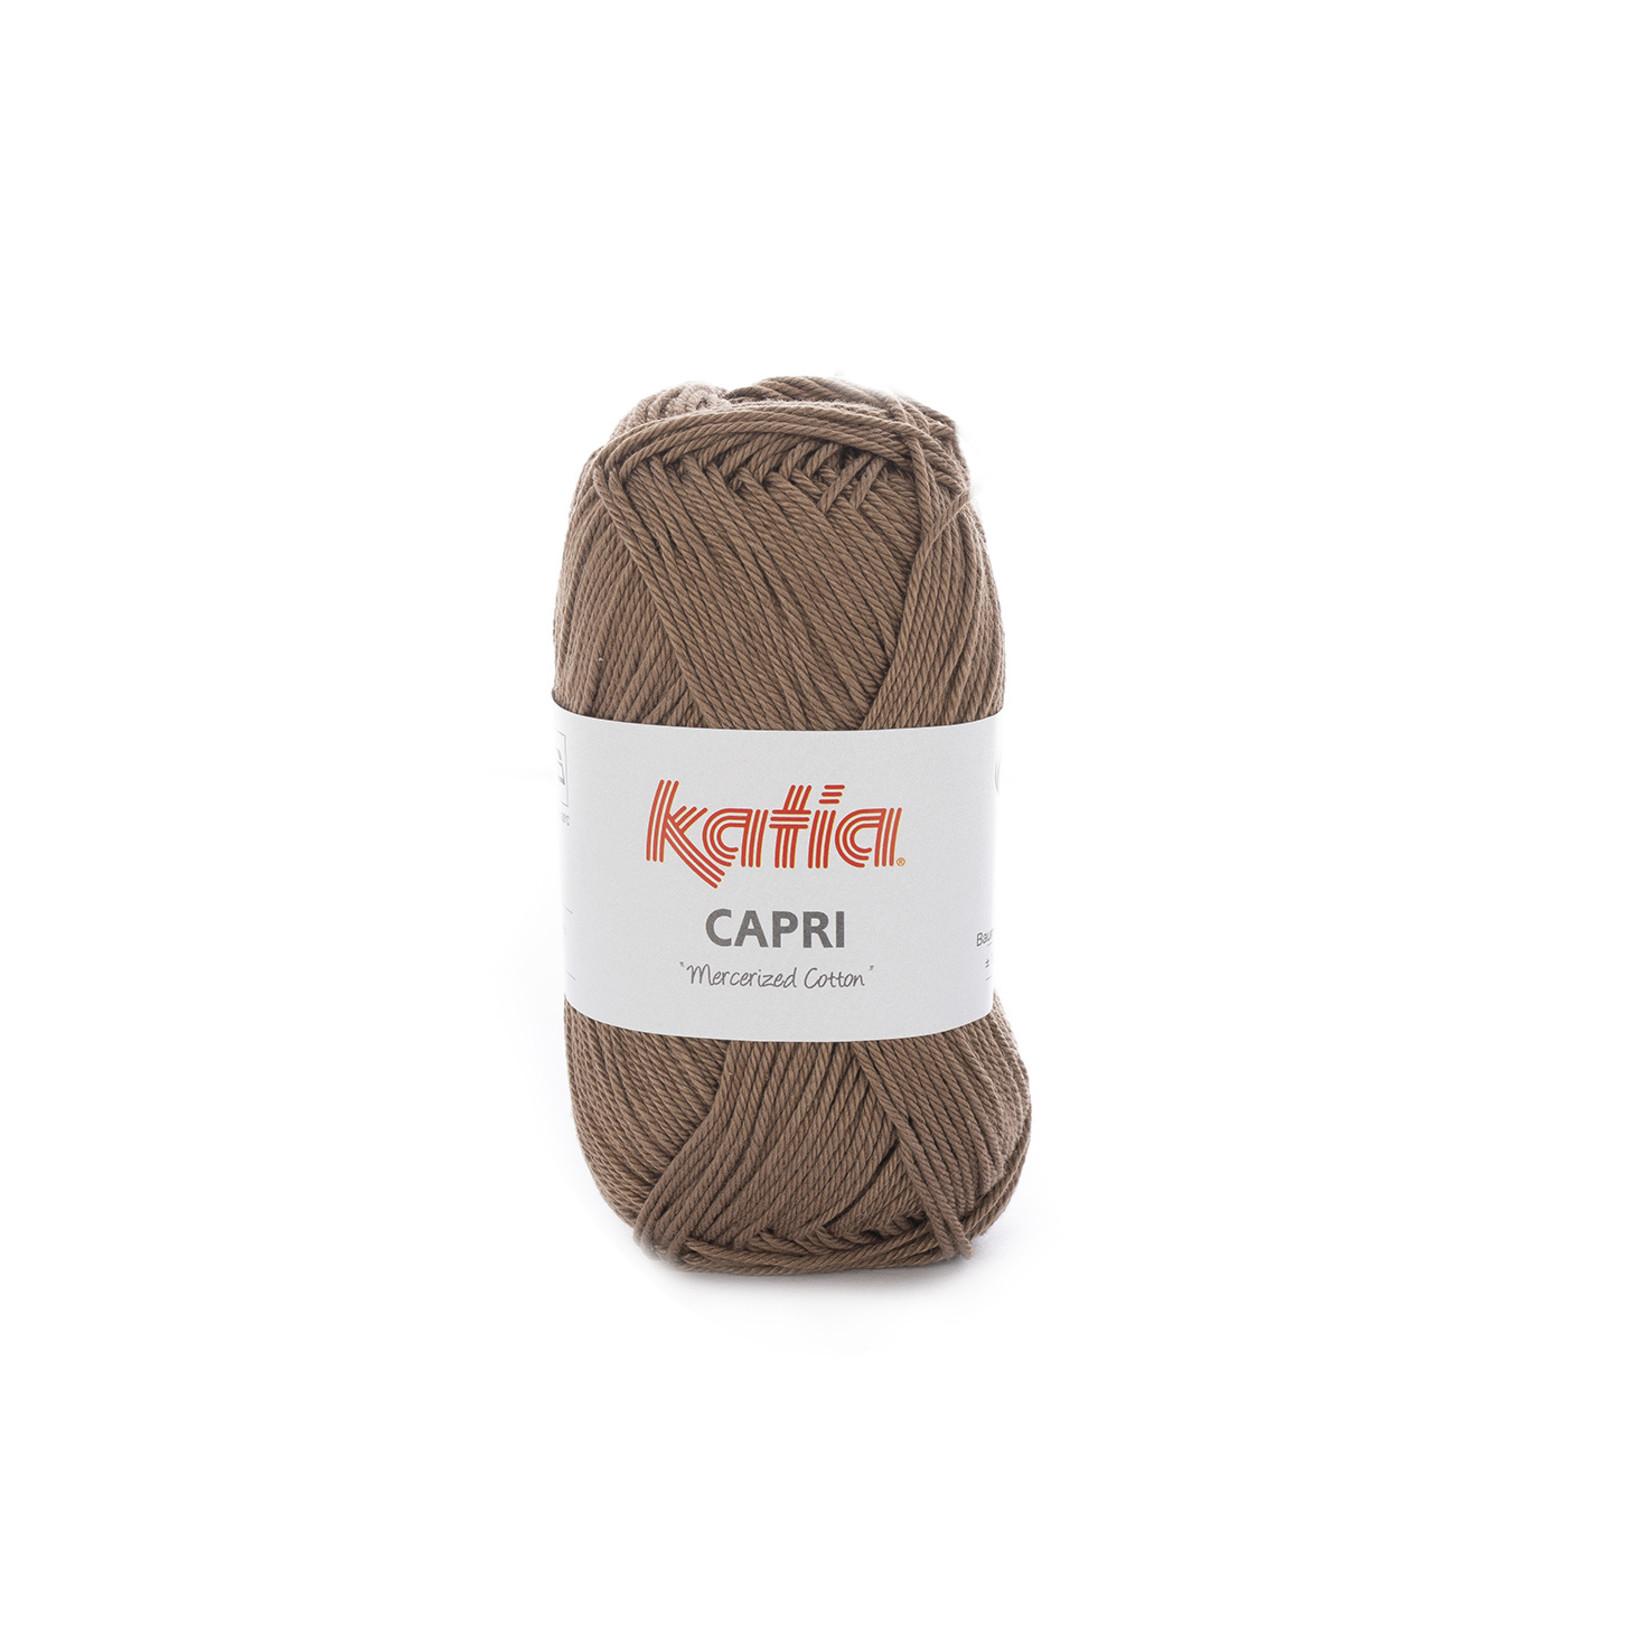 Katia Katia Capri - kleur 116 Bruin - 50 gr. = 125 m. - 100% katoen